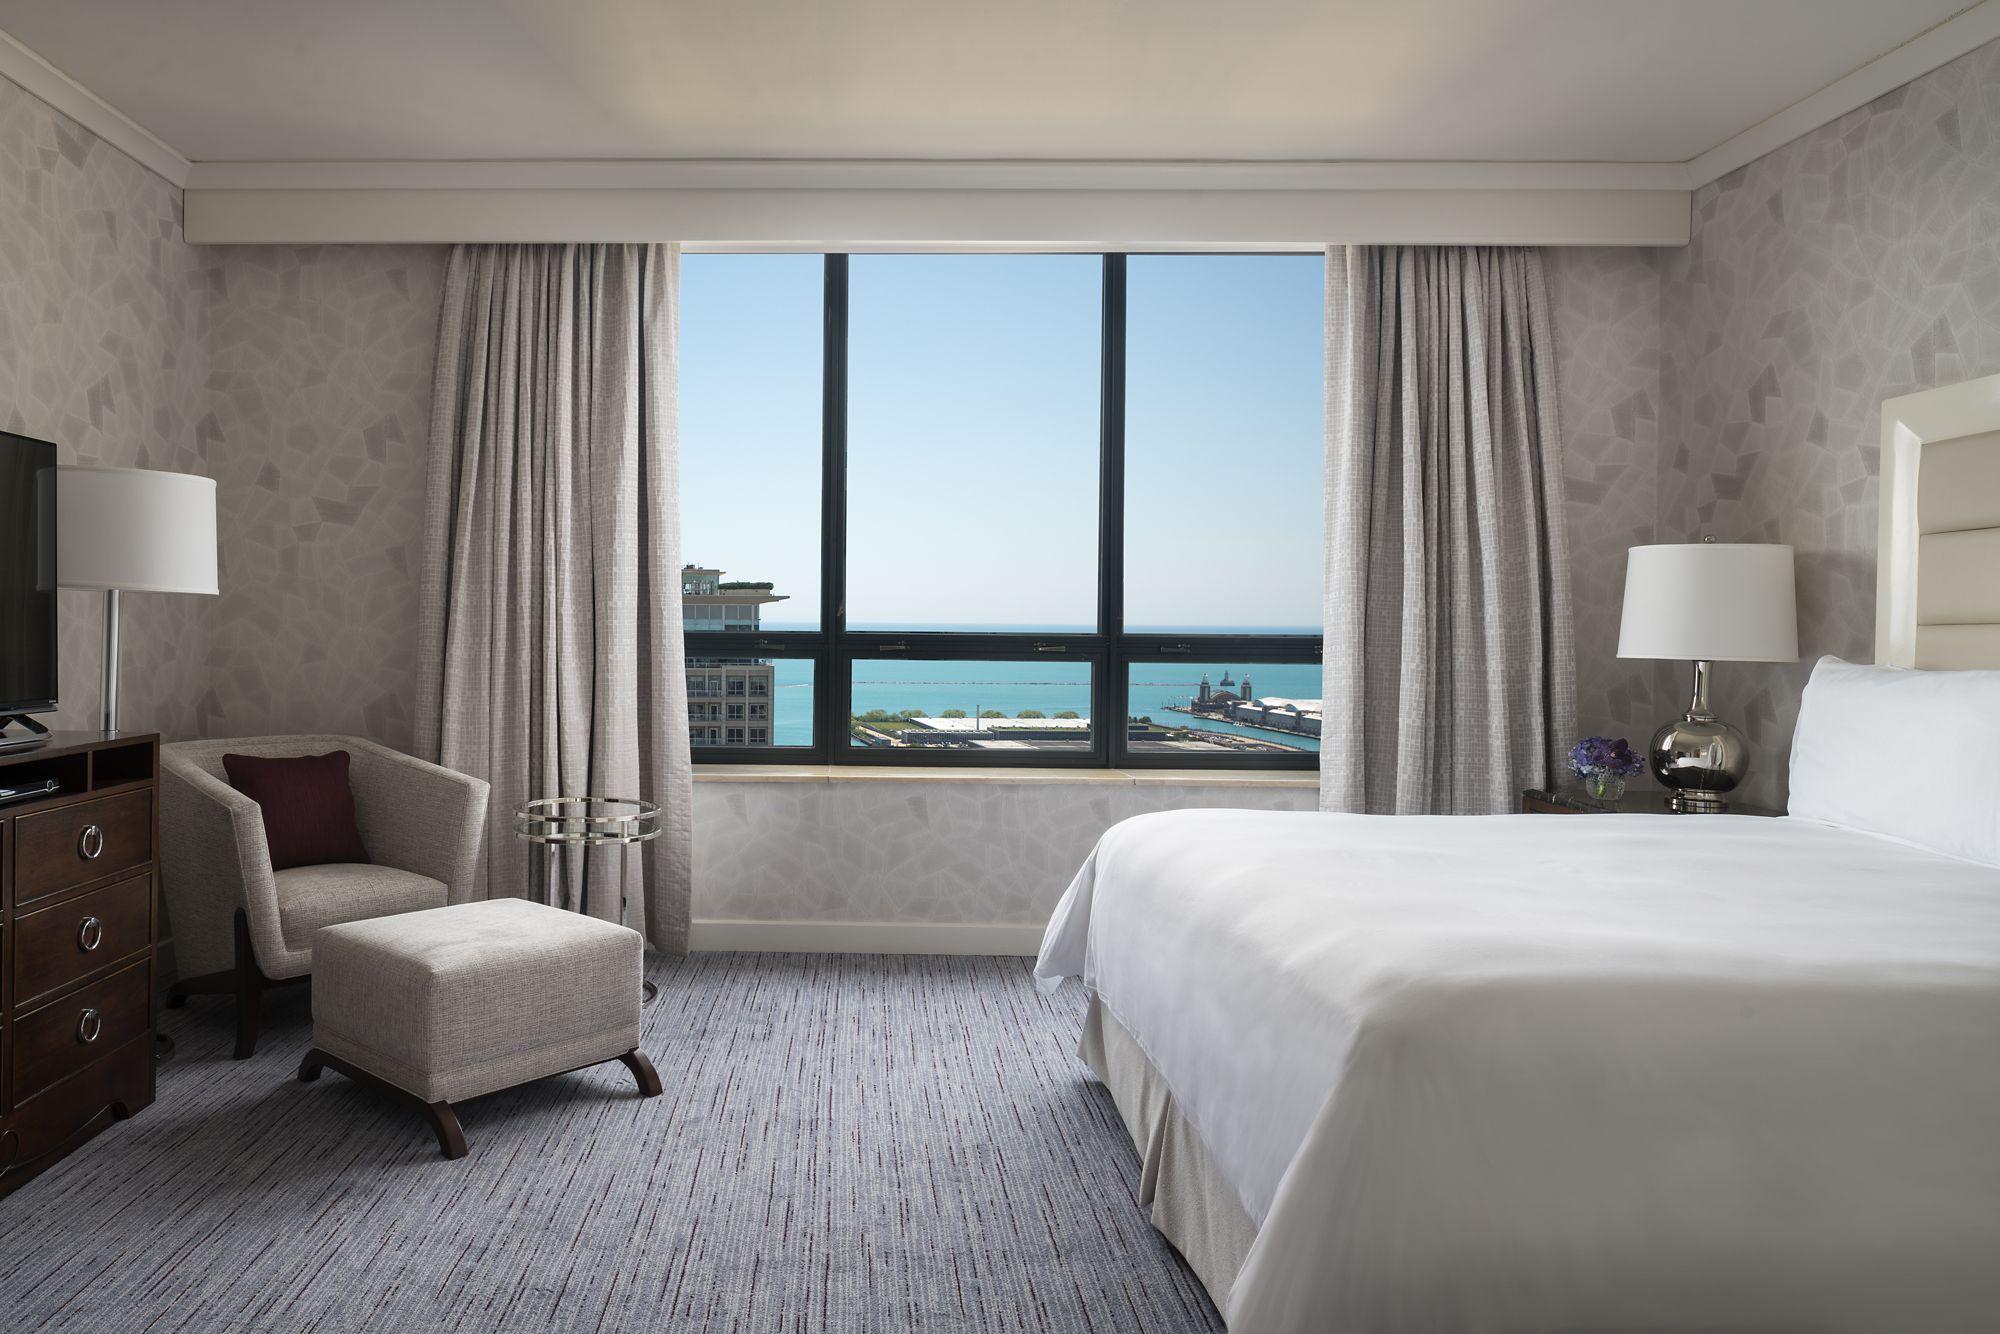 The Ritz-Carlton, Chicago image 10